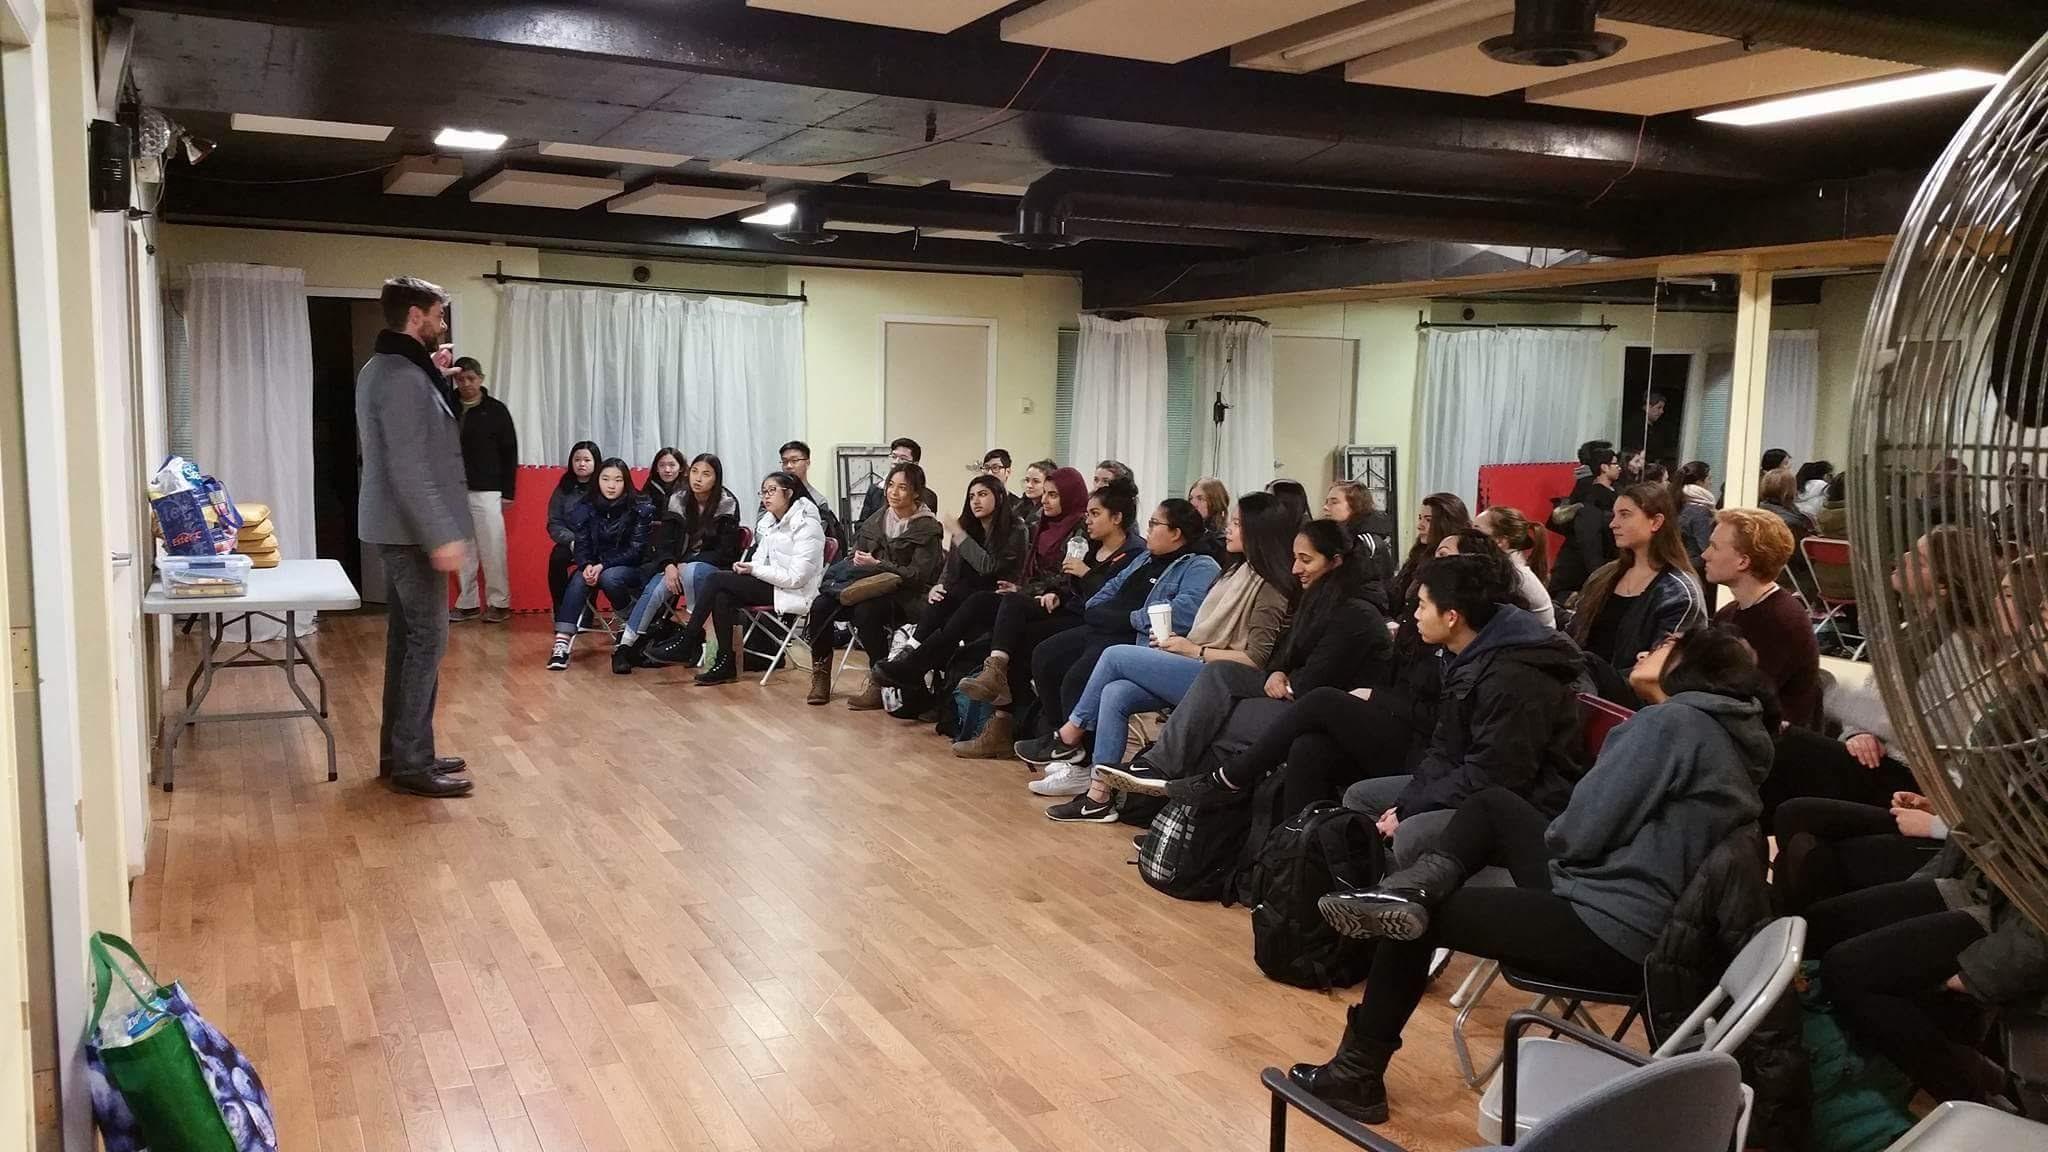 Compelling Stories - Speaking workshop for